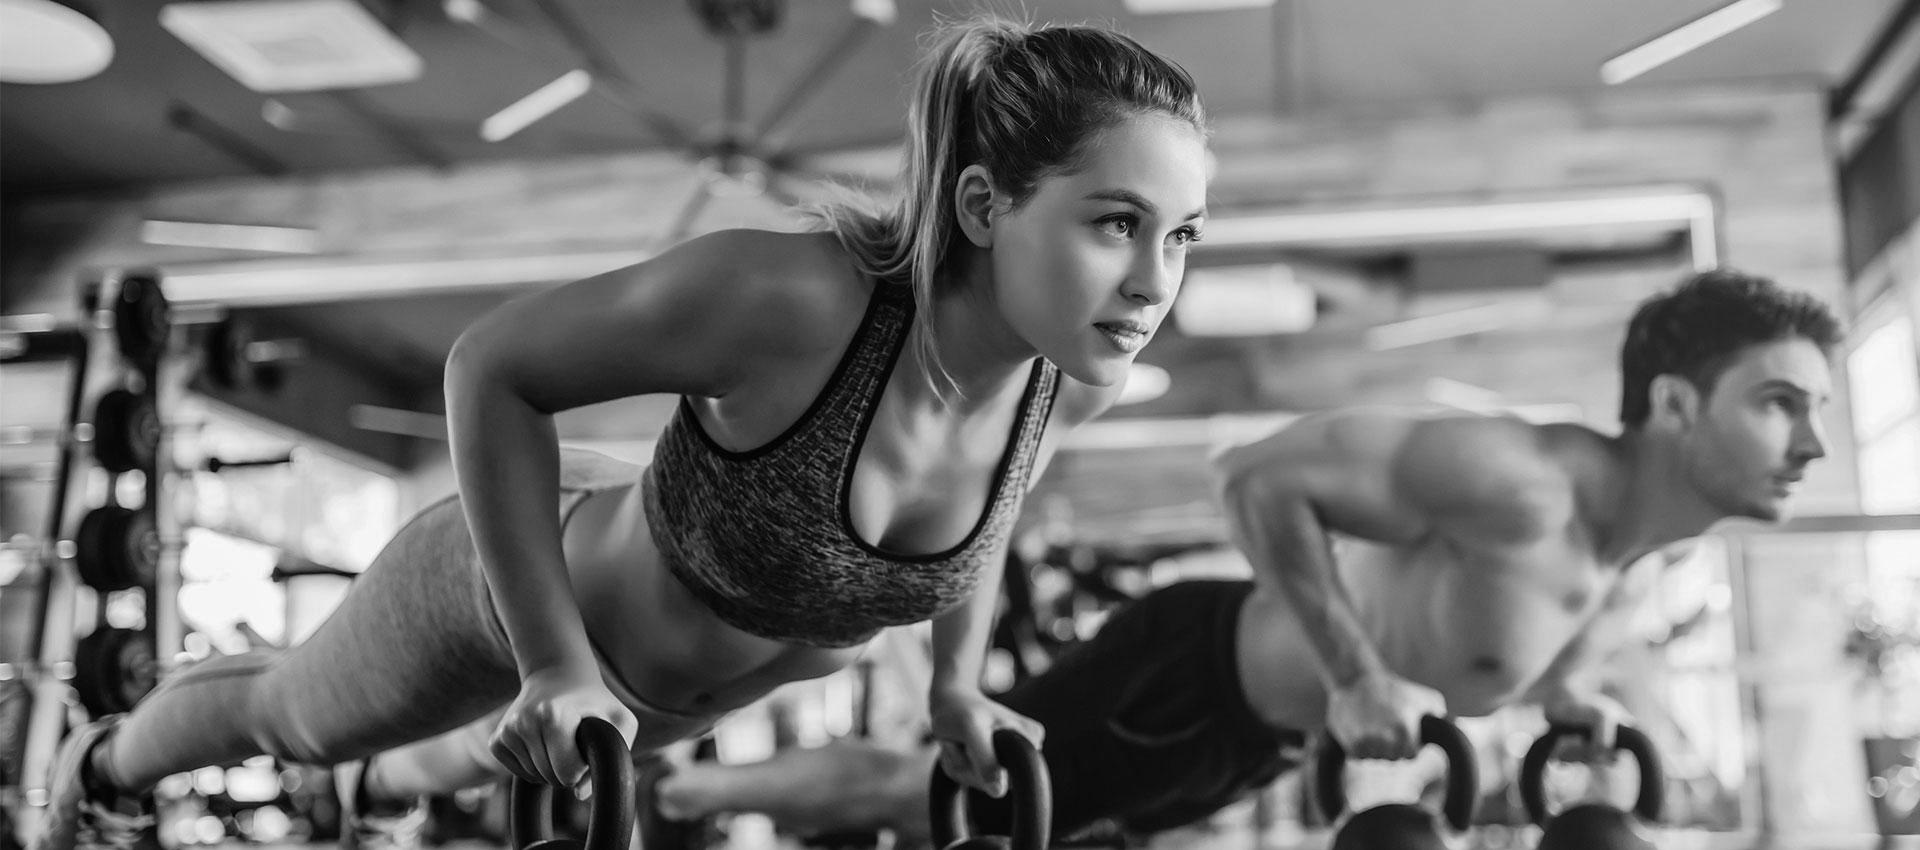 Man and woman at a gym